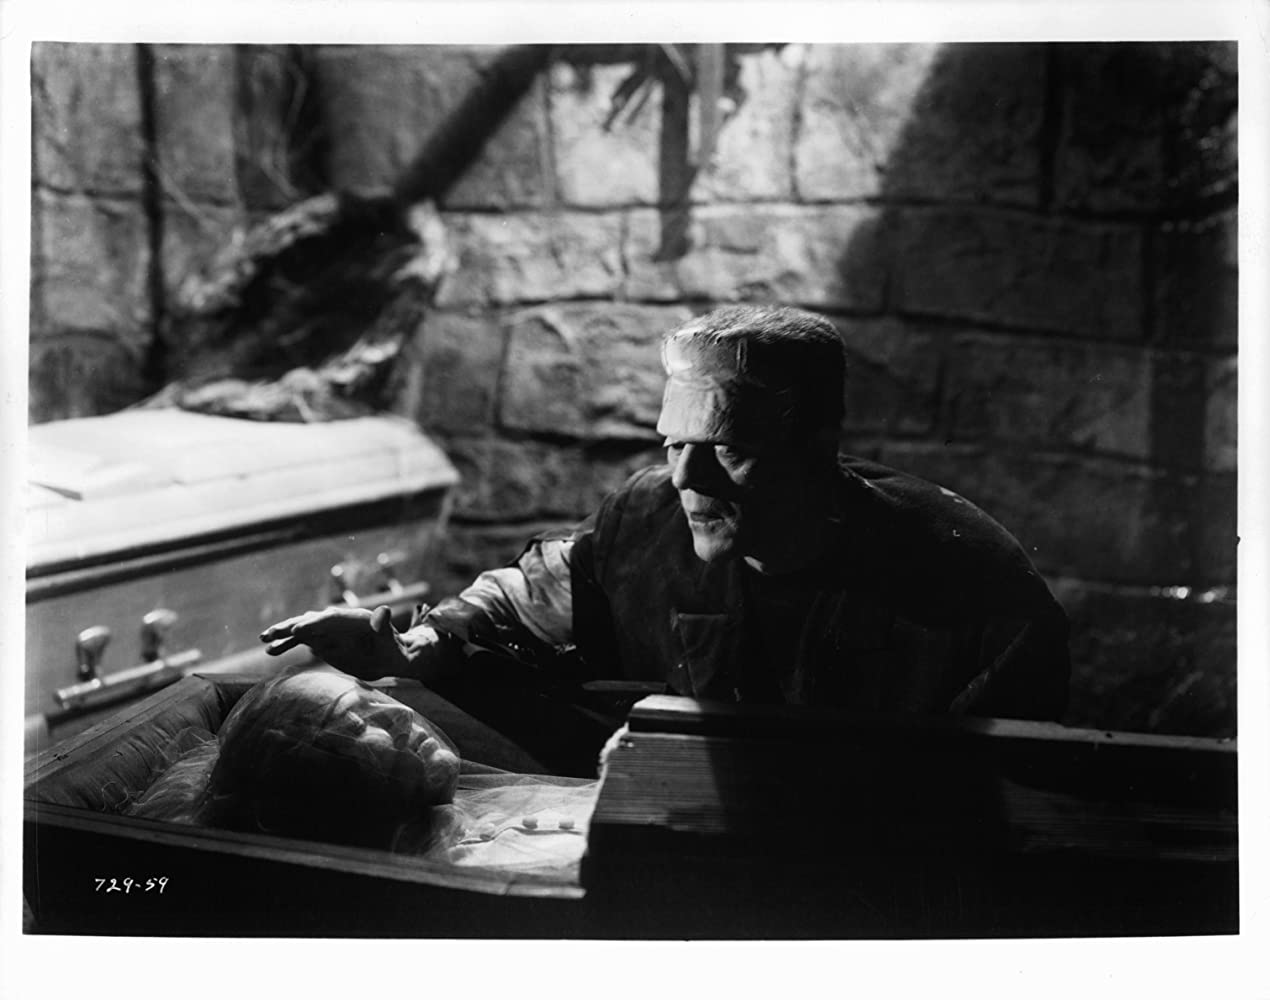 Boris Karloff in Bride of Frankenstein (1935)